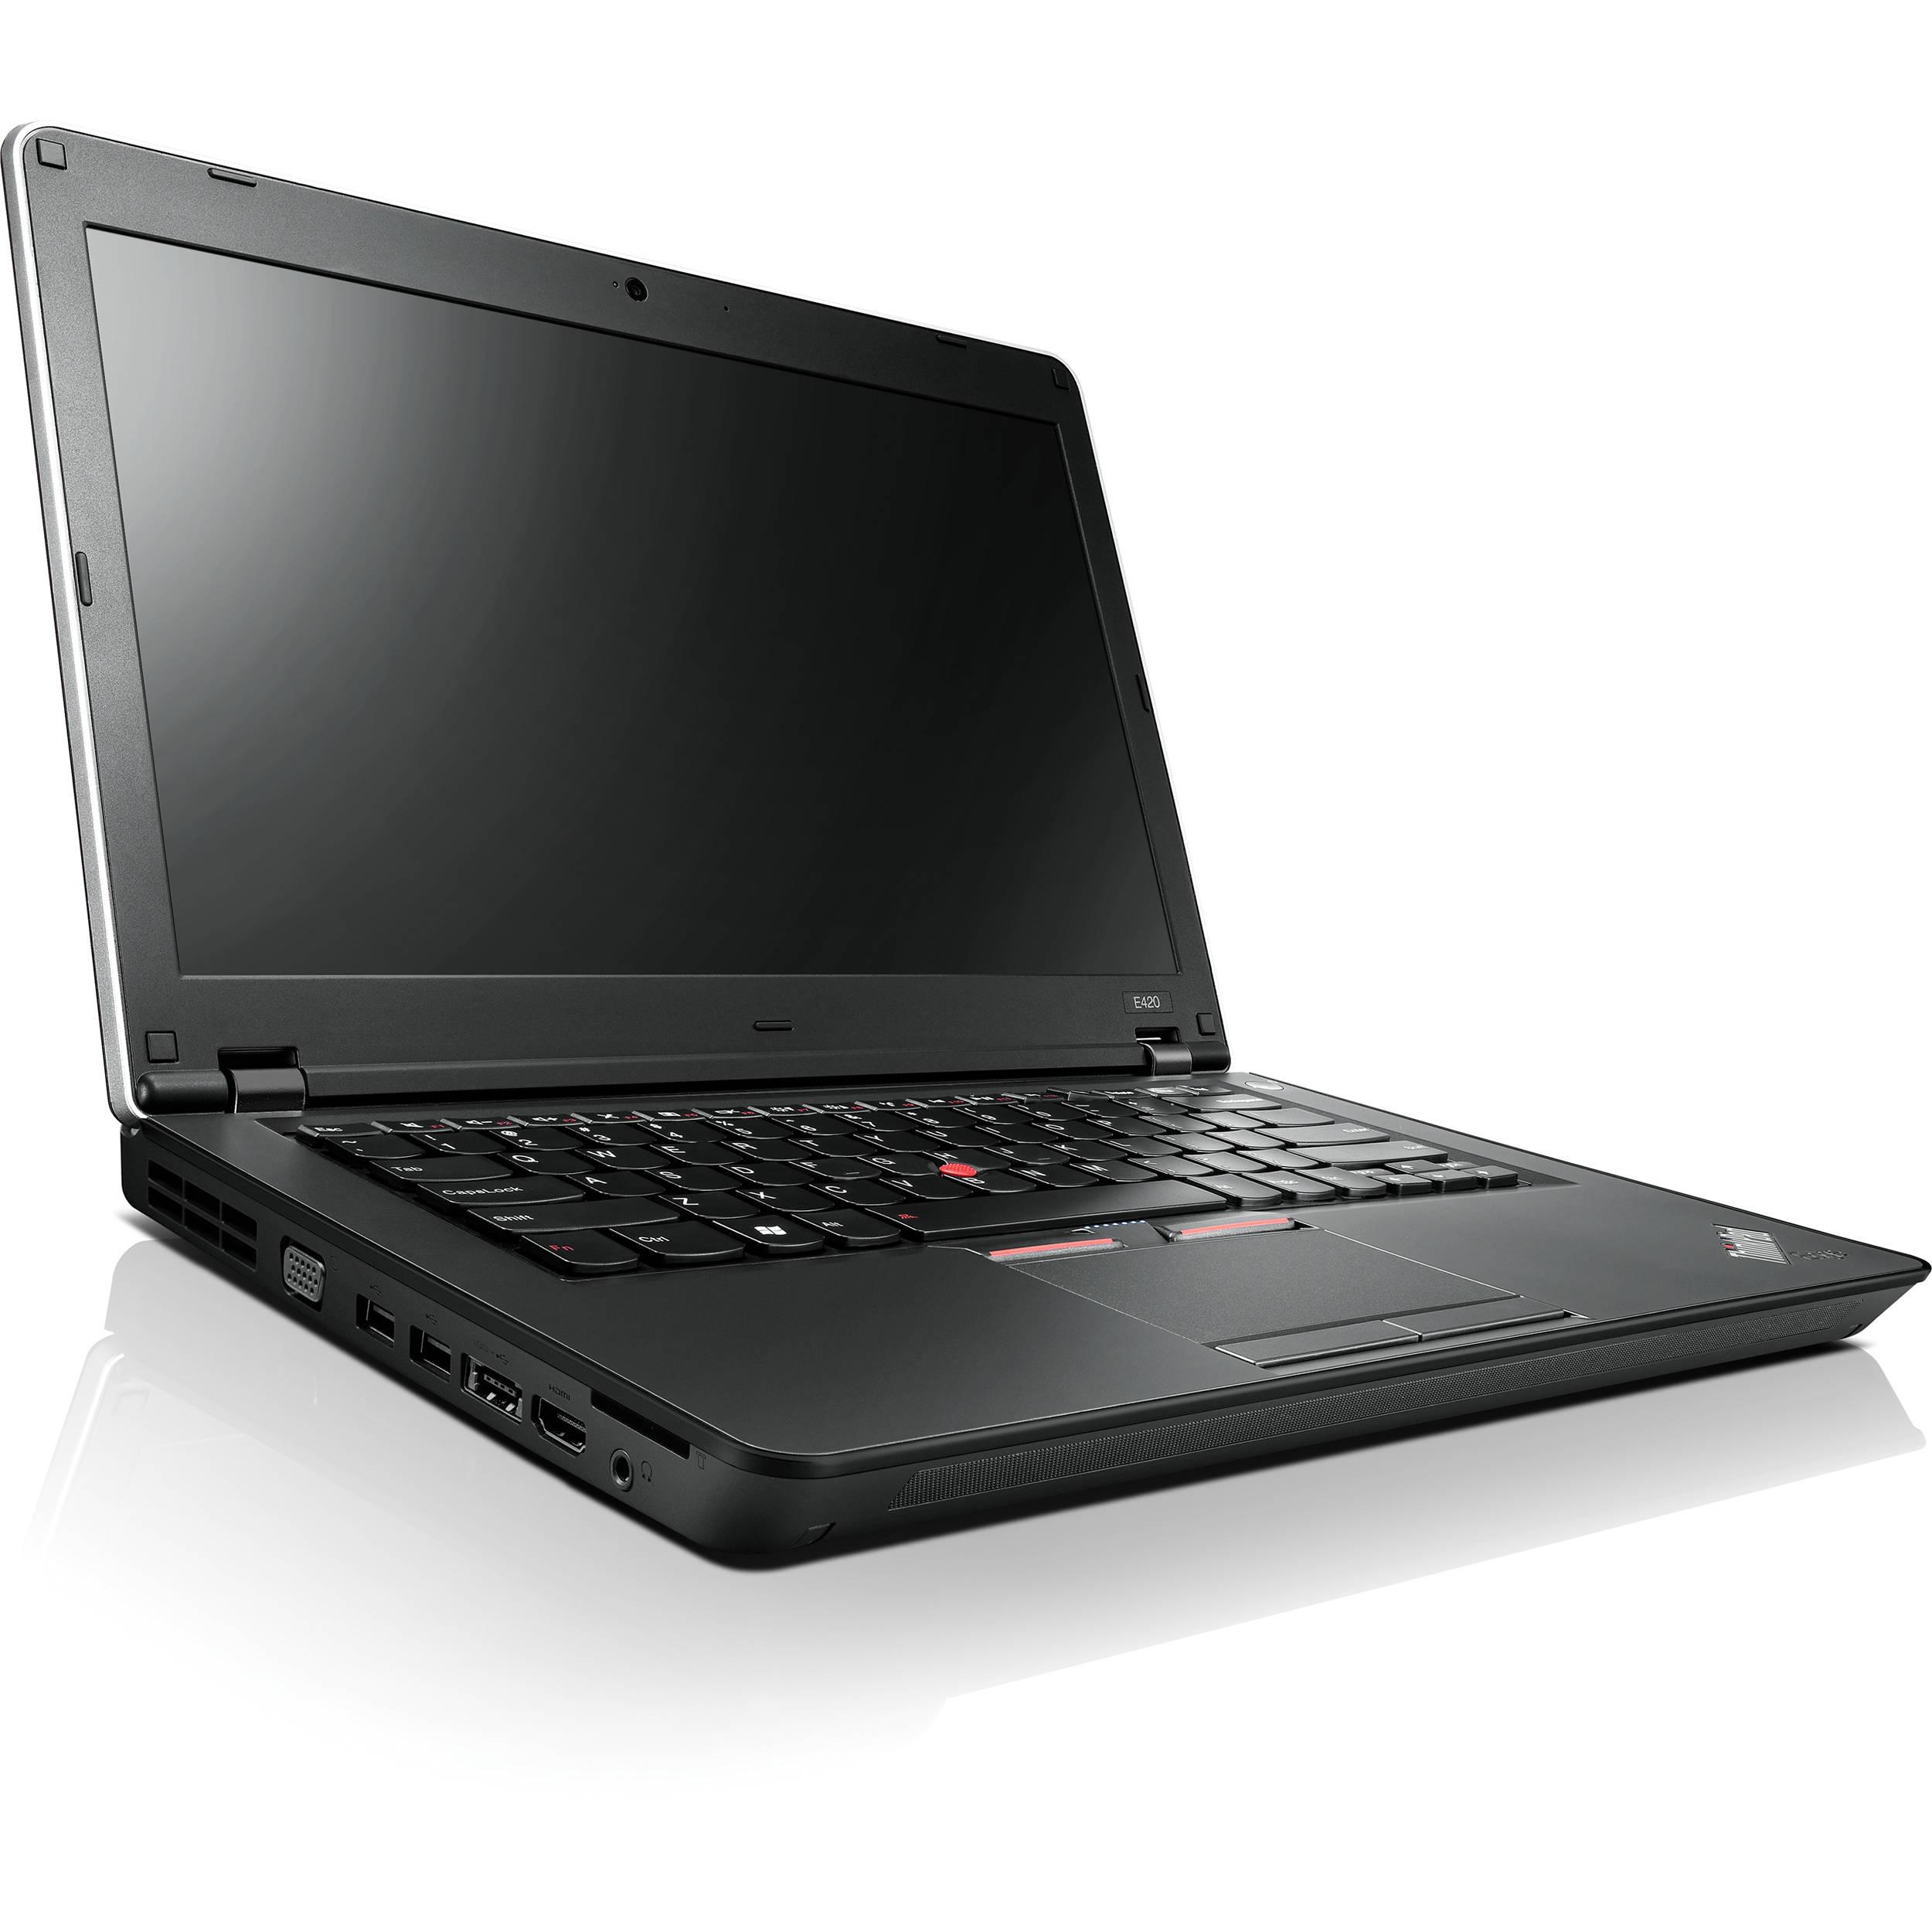 Lenovo ThinkPad Edge E420 1x1 WLAN Drivers for Windows 7